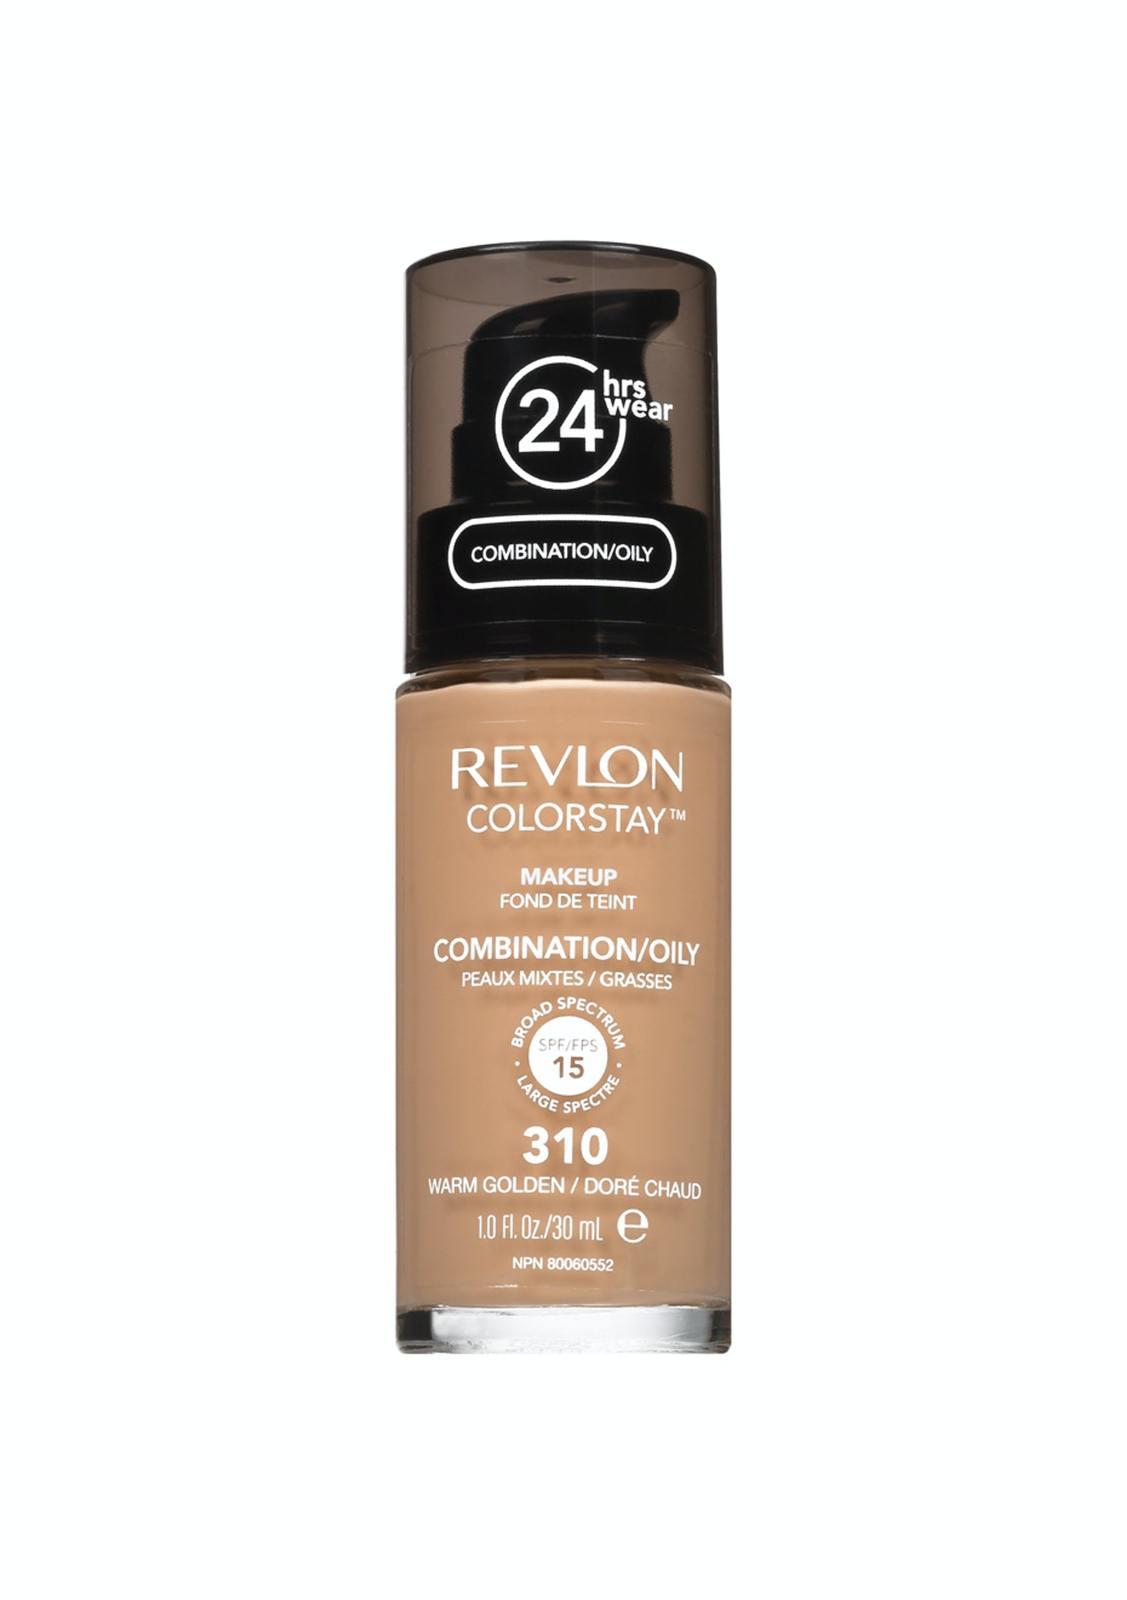 Revlon: Colorstay Foundation - Warm Golden image